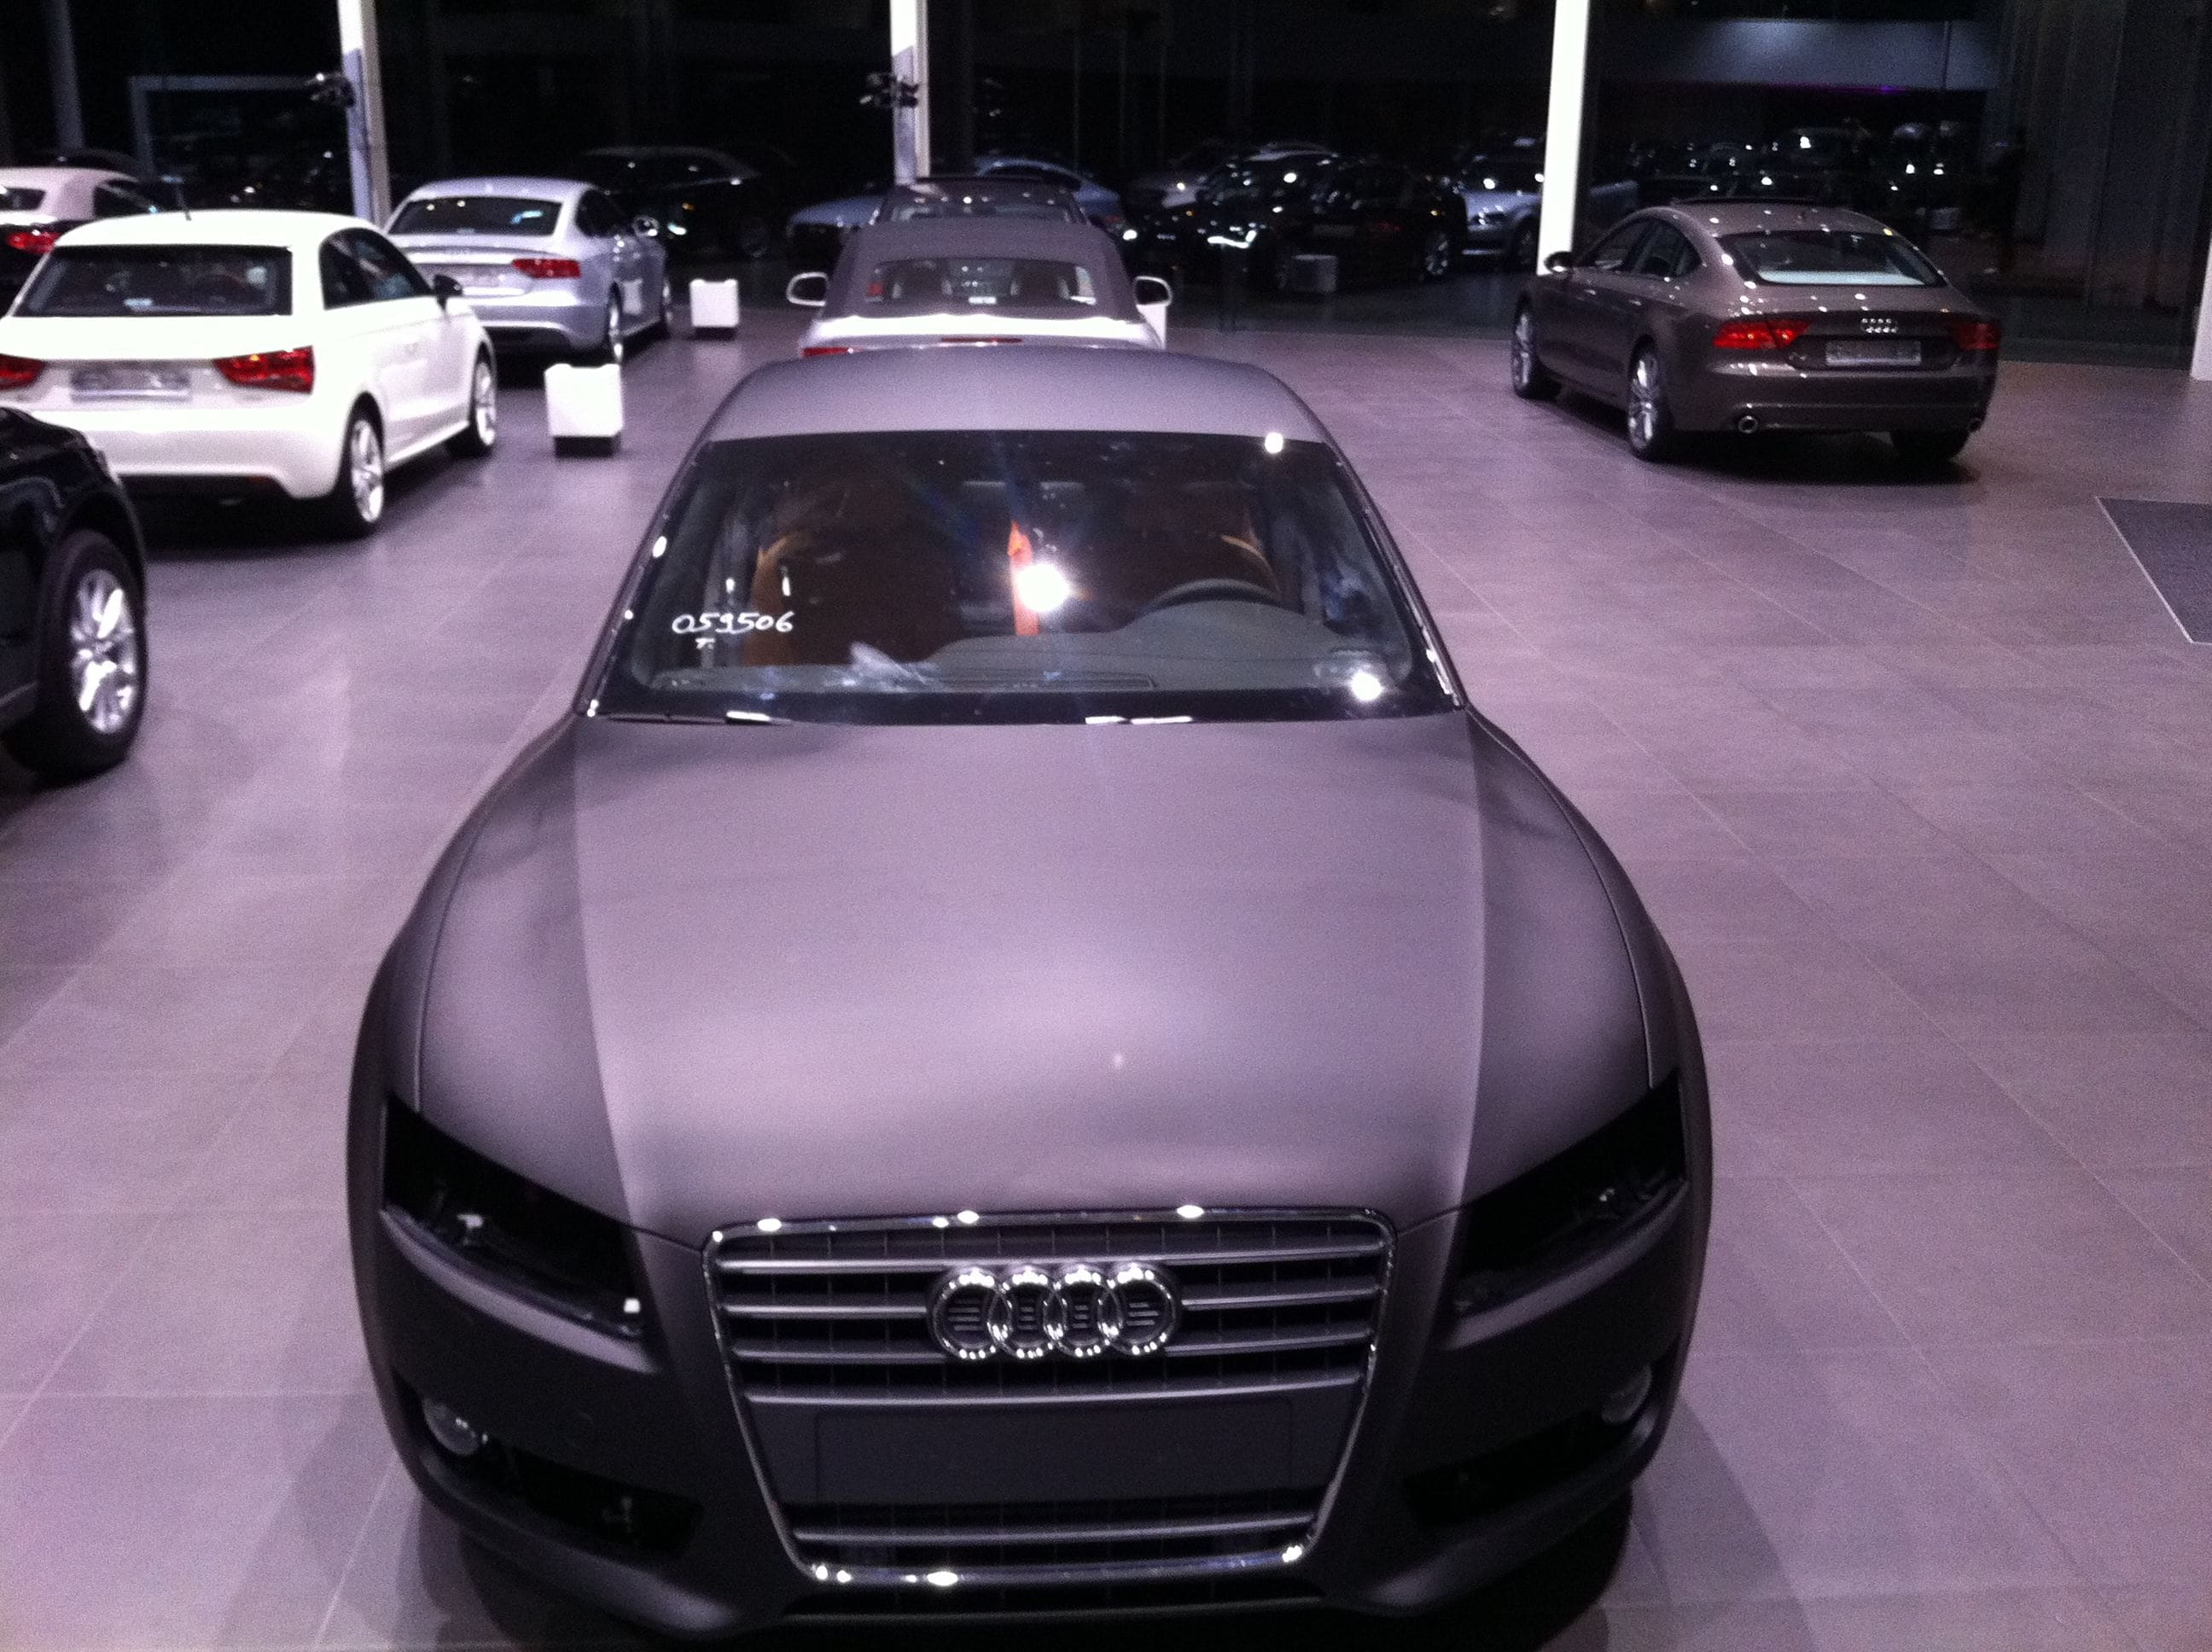 Audi A5 Sportback met Mat Grijze Wrap, Carwrapping door Wrapmyride.nu Foto-nr:4796, ©2021